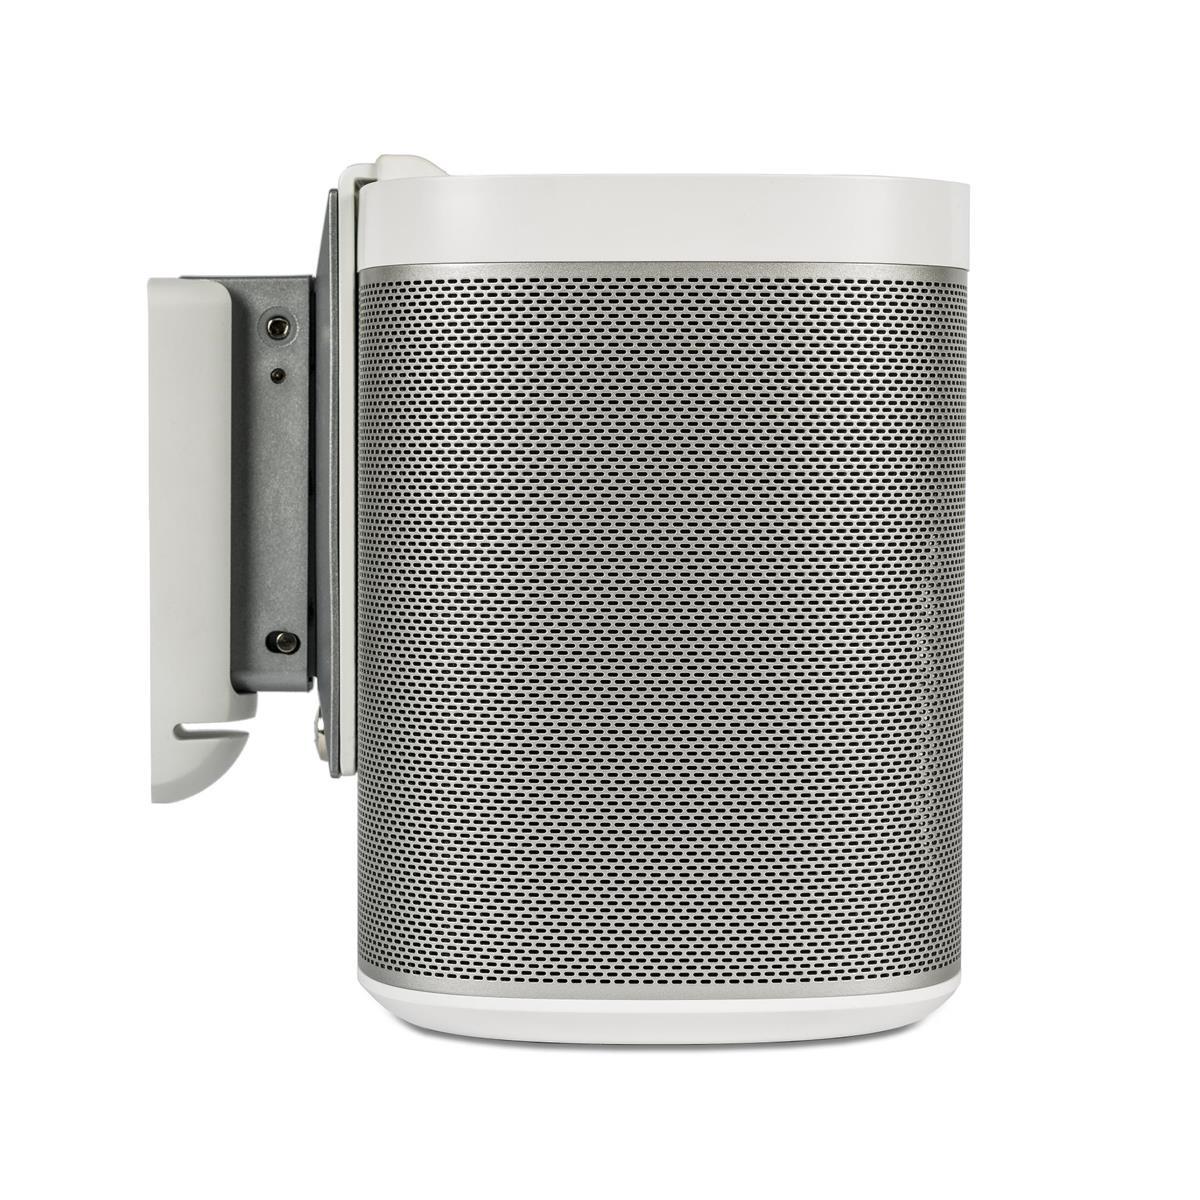 White Sonos Play 3 Speaker on Wall Mount Bracket - Side View - 01.jpg